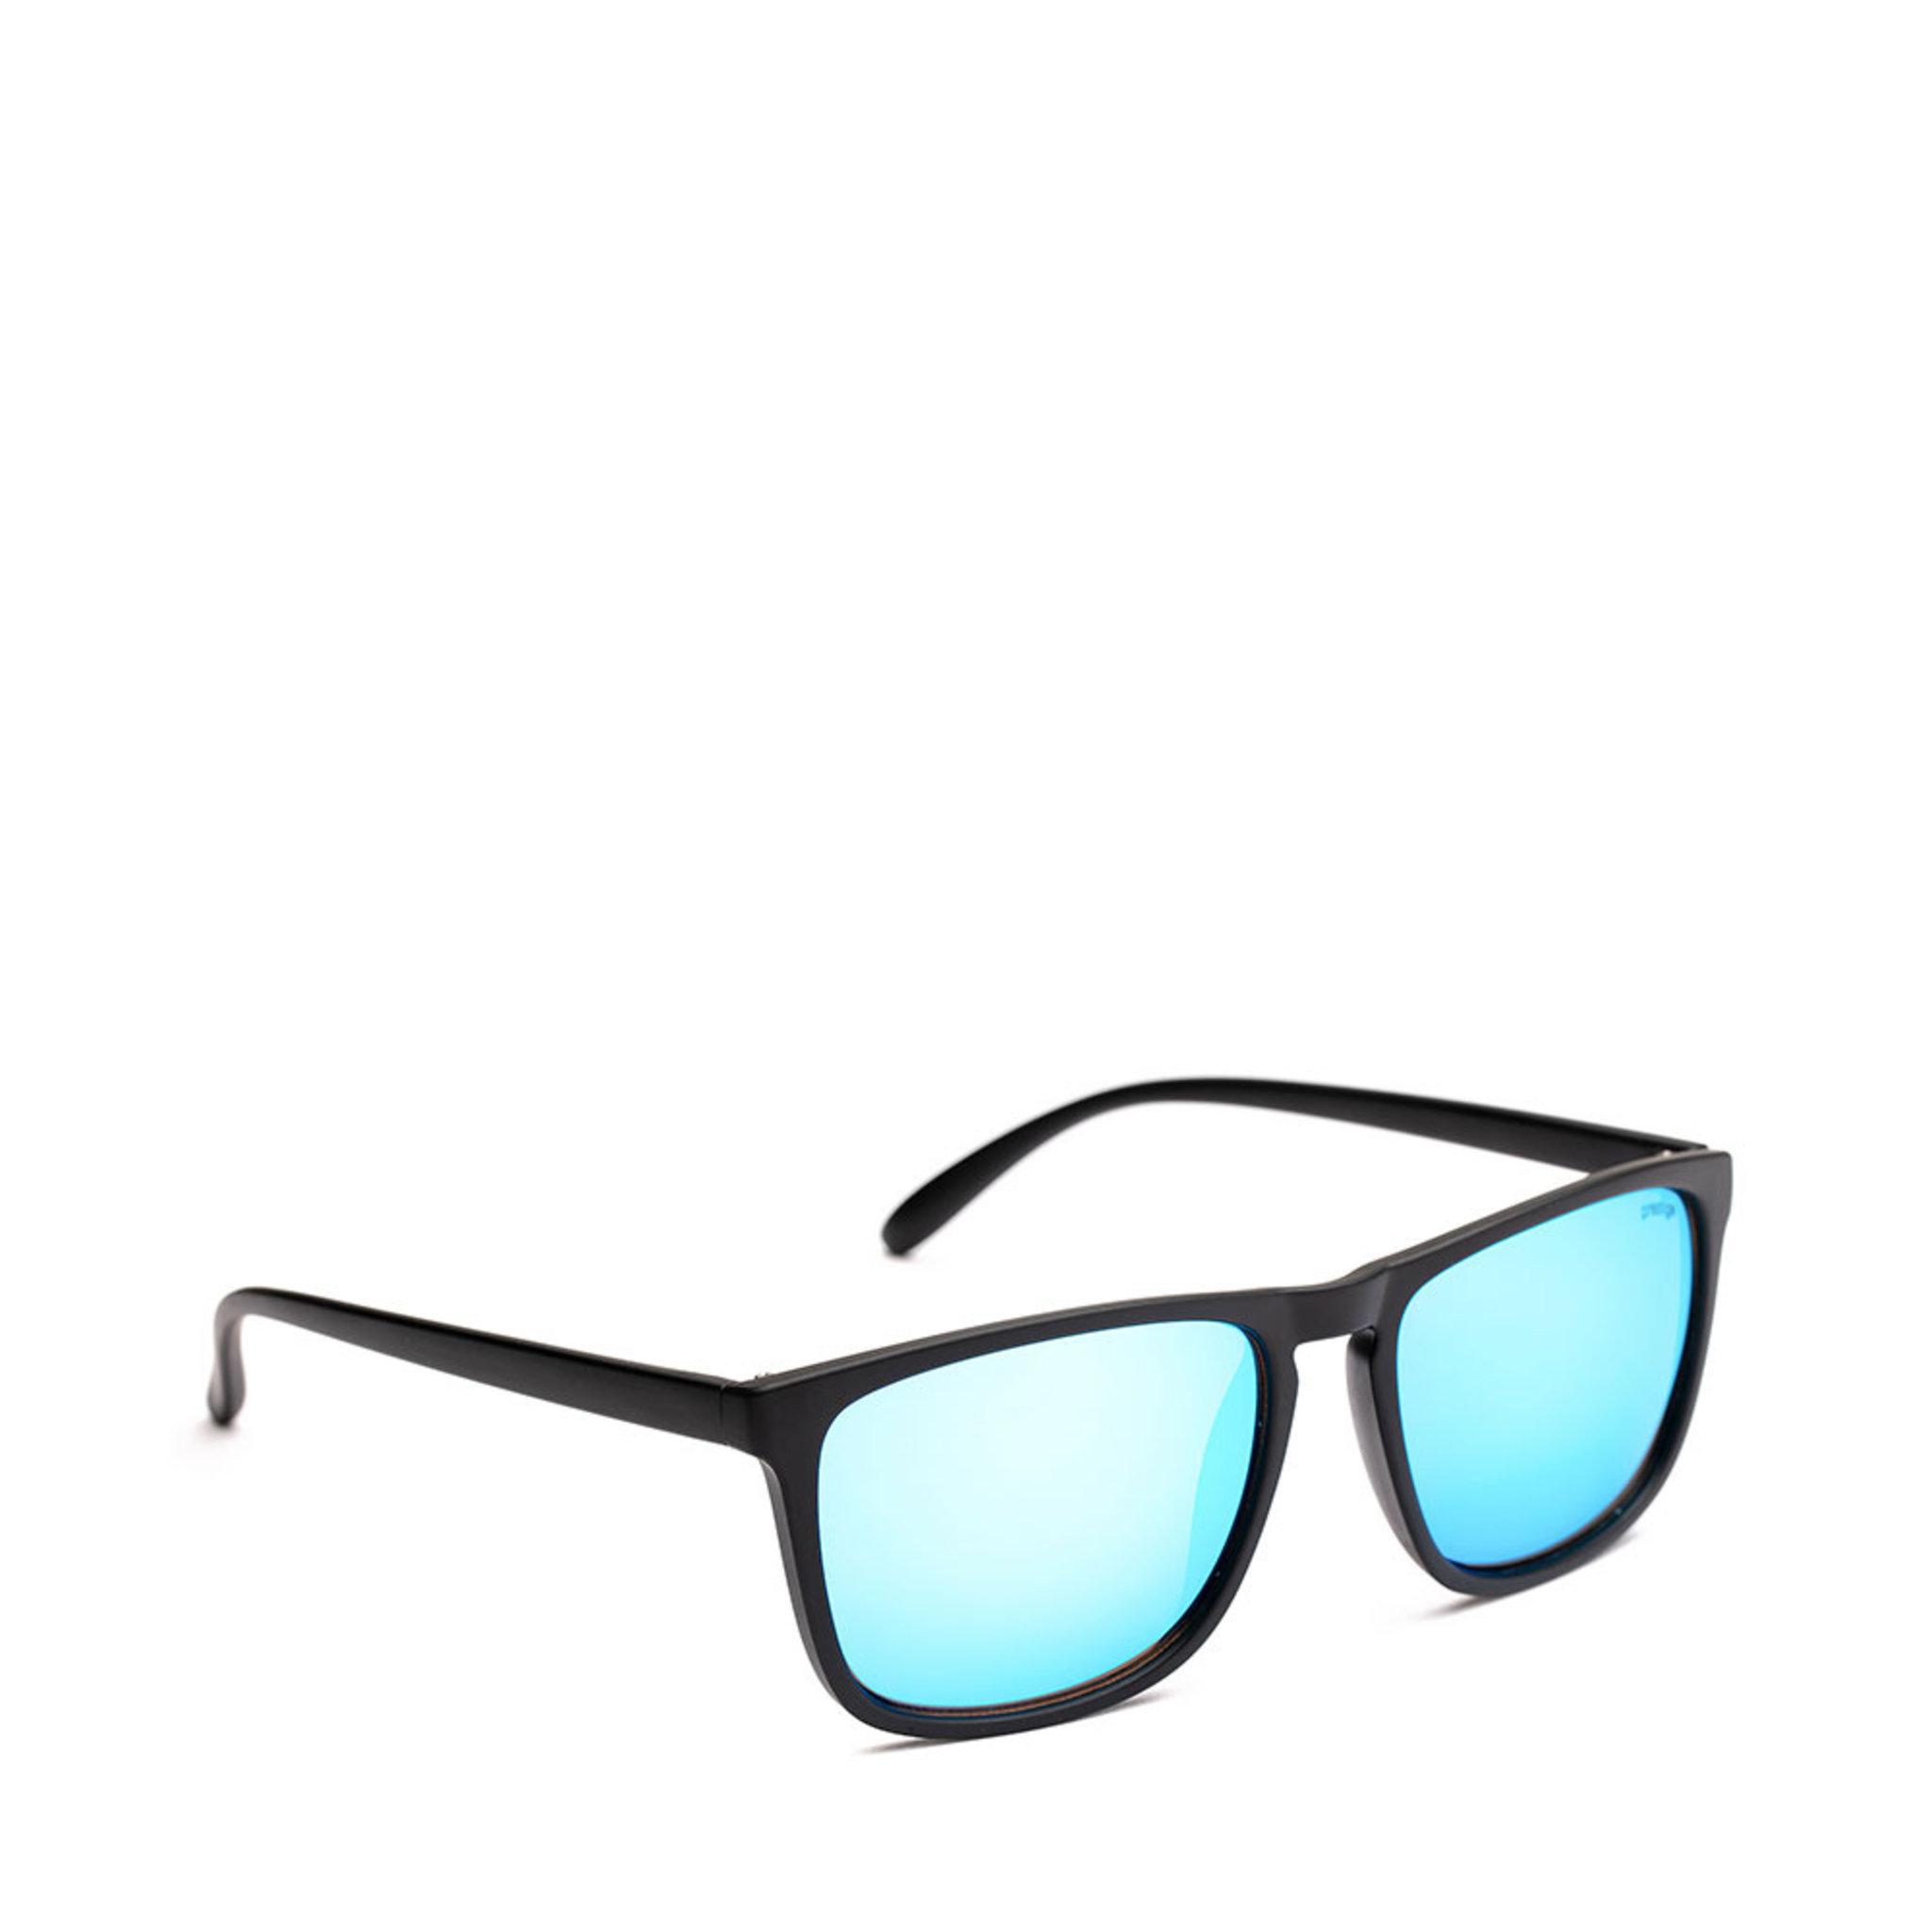 Solglasögon Jerry